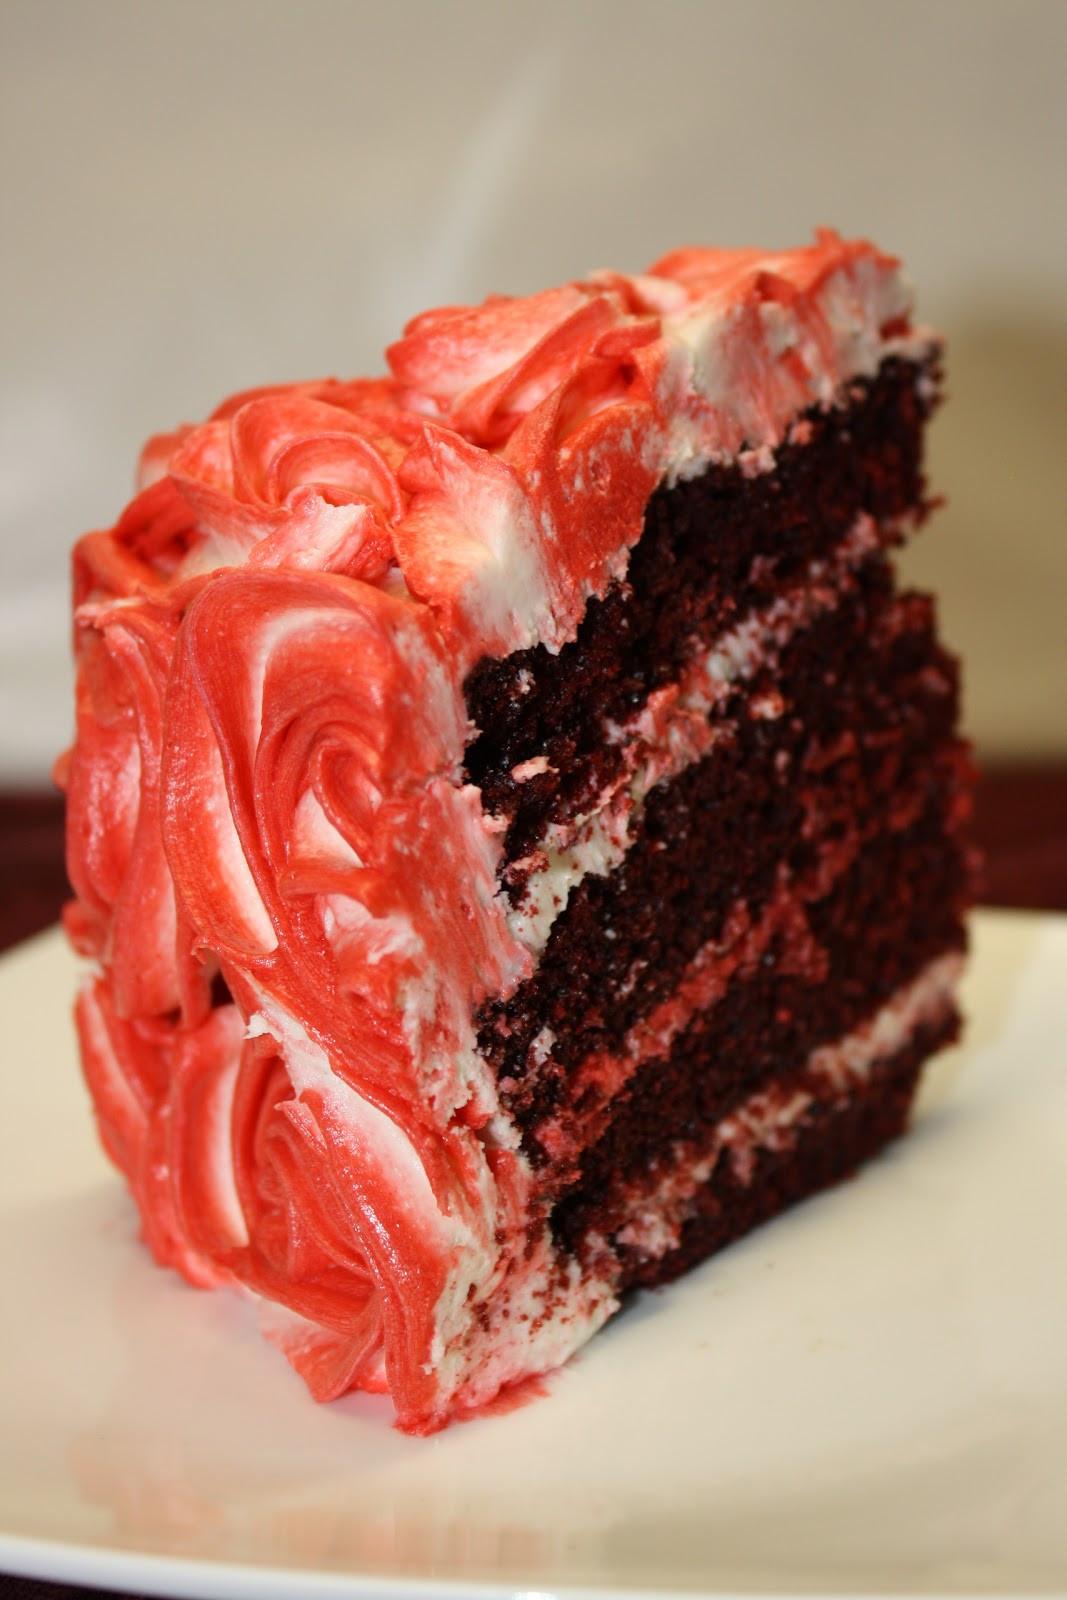 Best Red Velvet Cake  The best Red Velvet Cake that happens to be Vegan